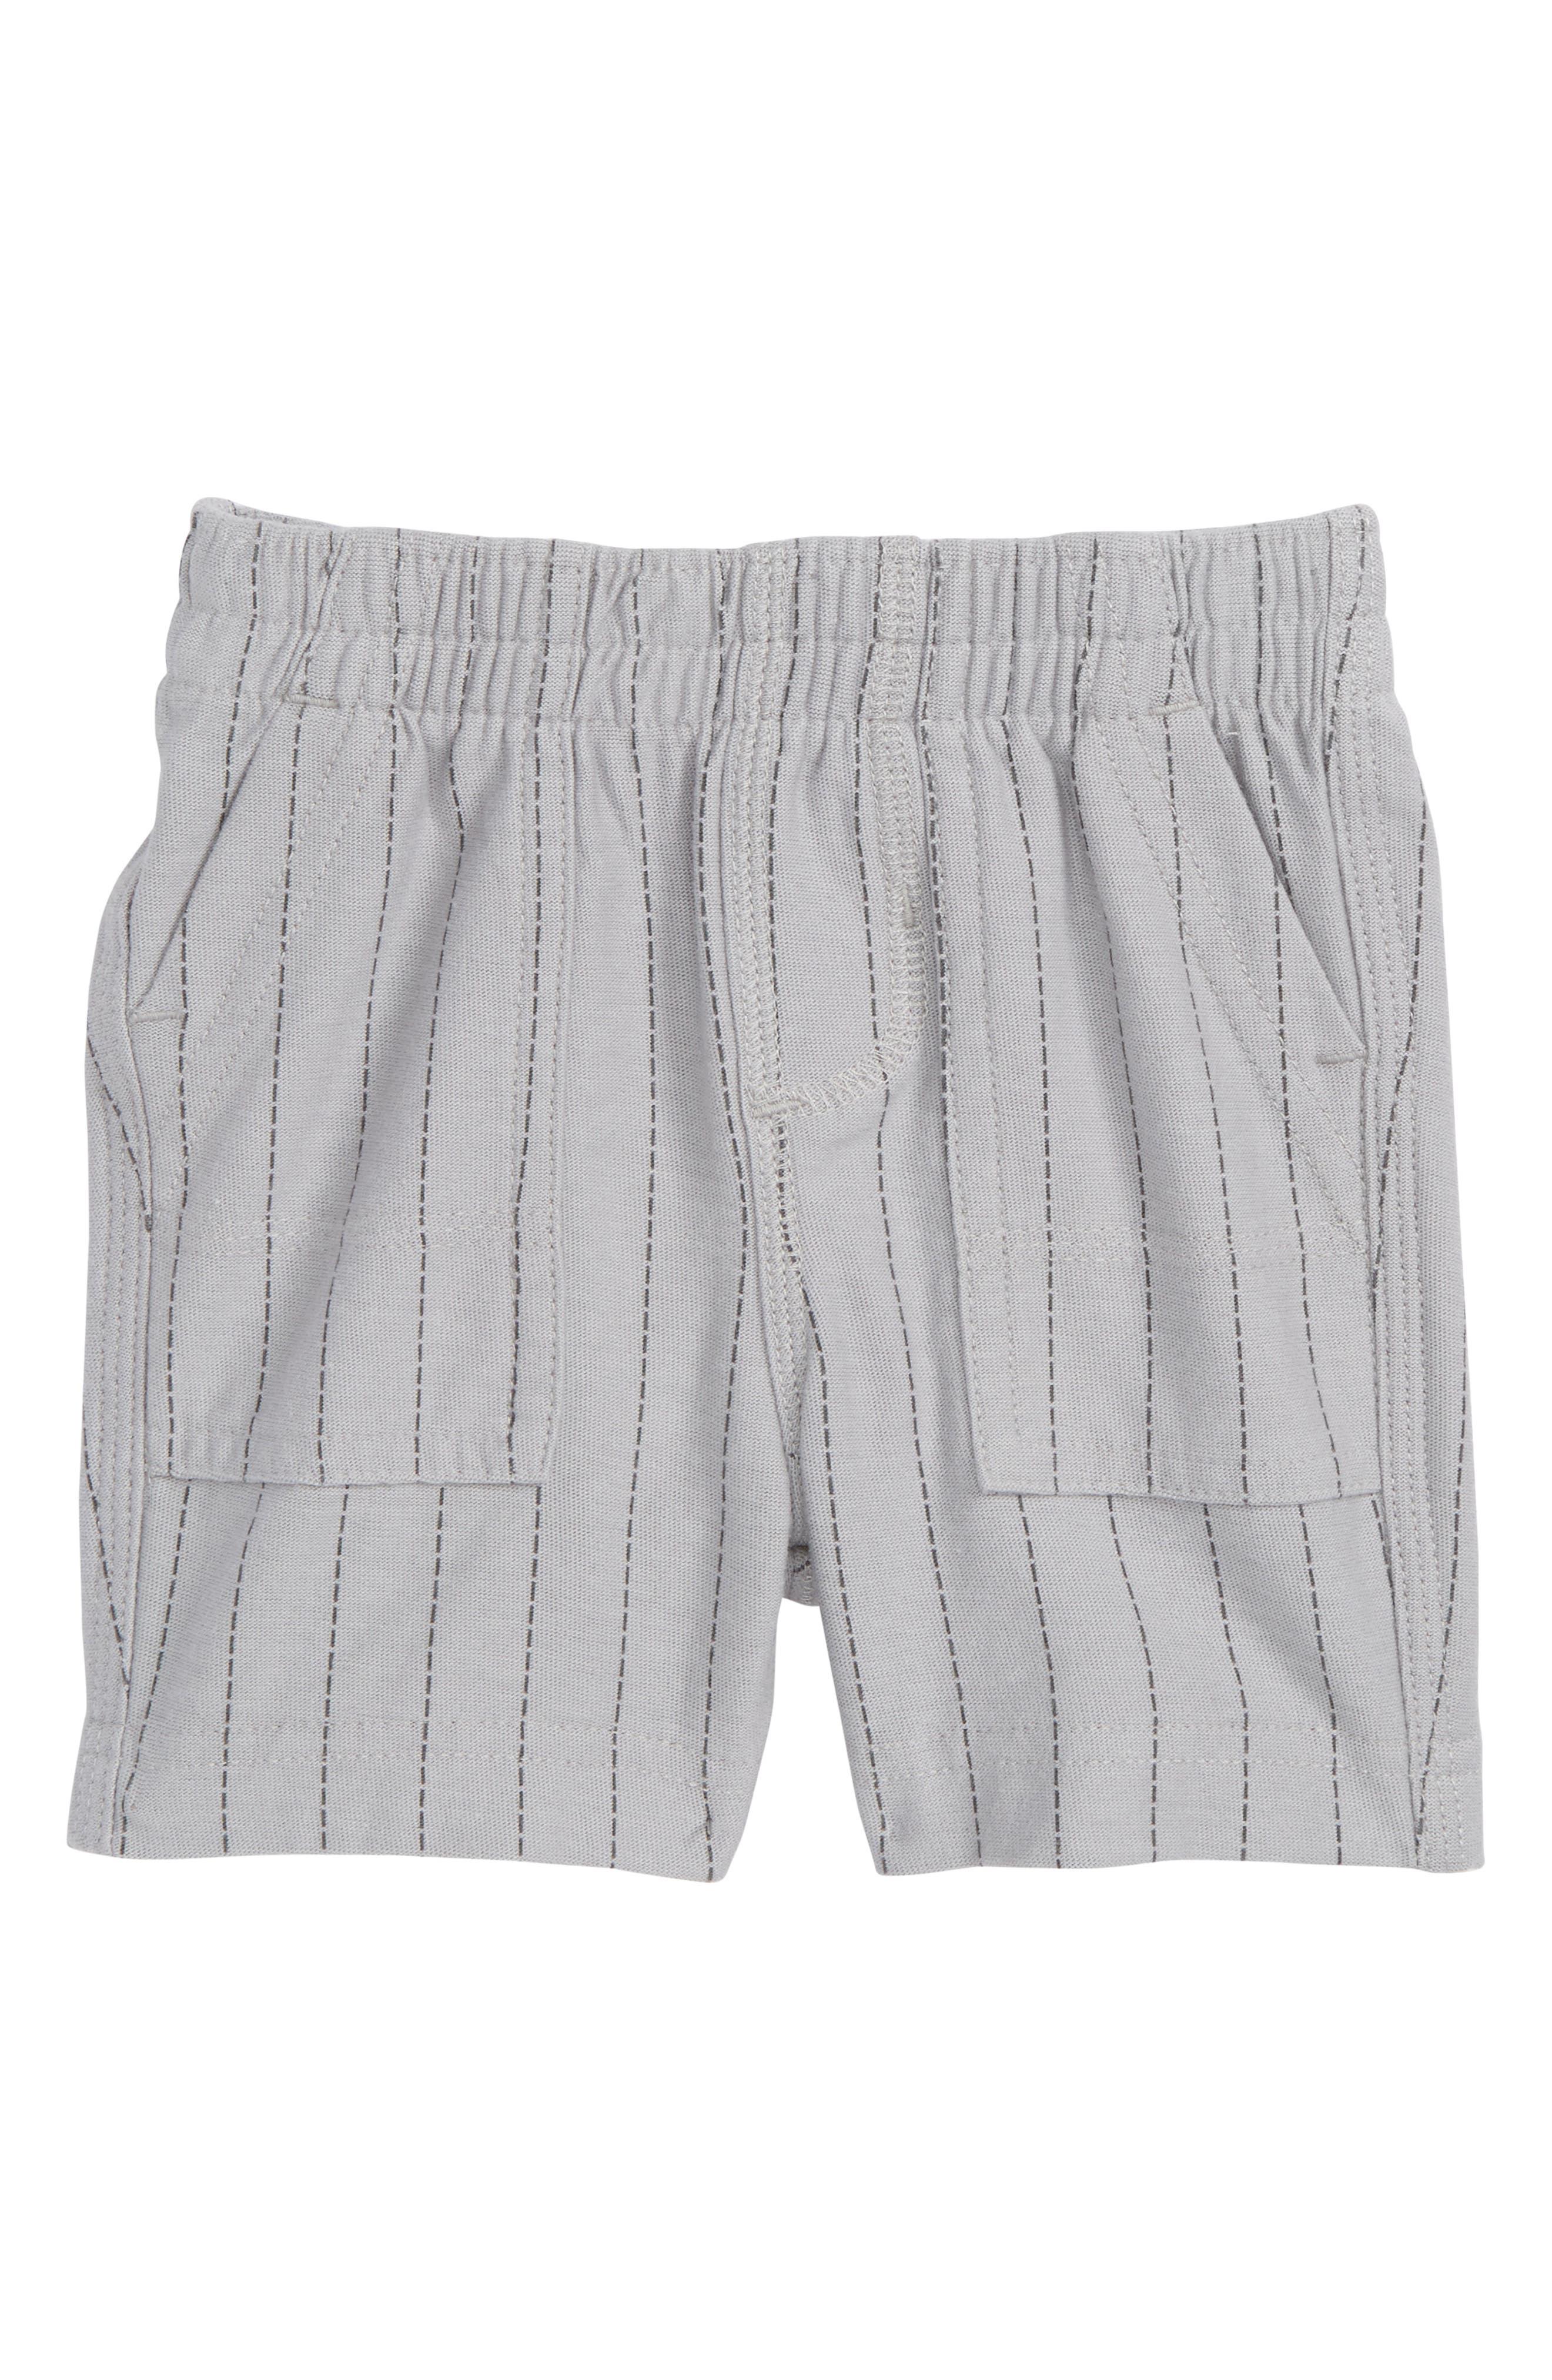 Stripe Shorts,                         Main,                         color, Storm Grey Ticking Stripe